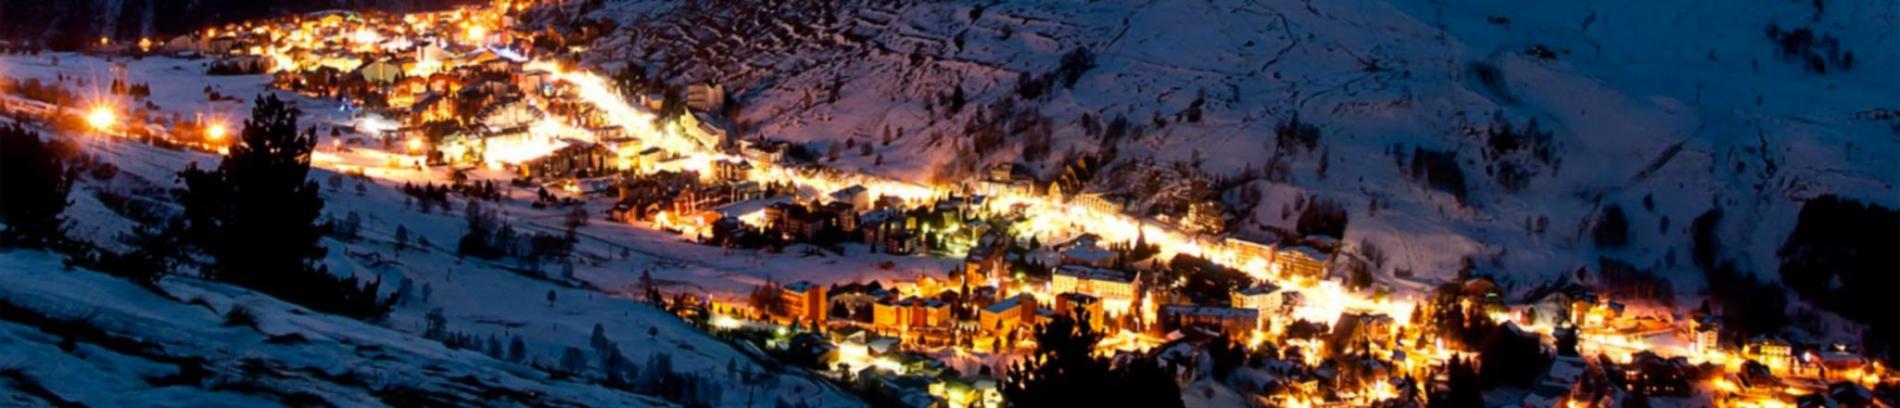 Slide la station des 2 Alpes de nuit